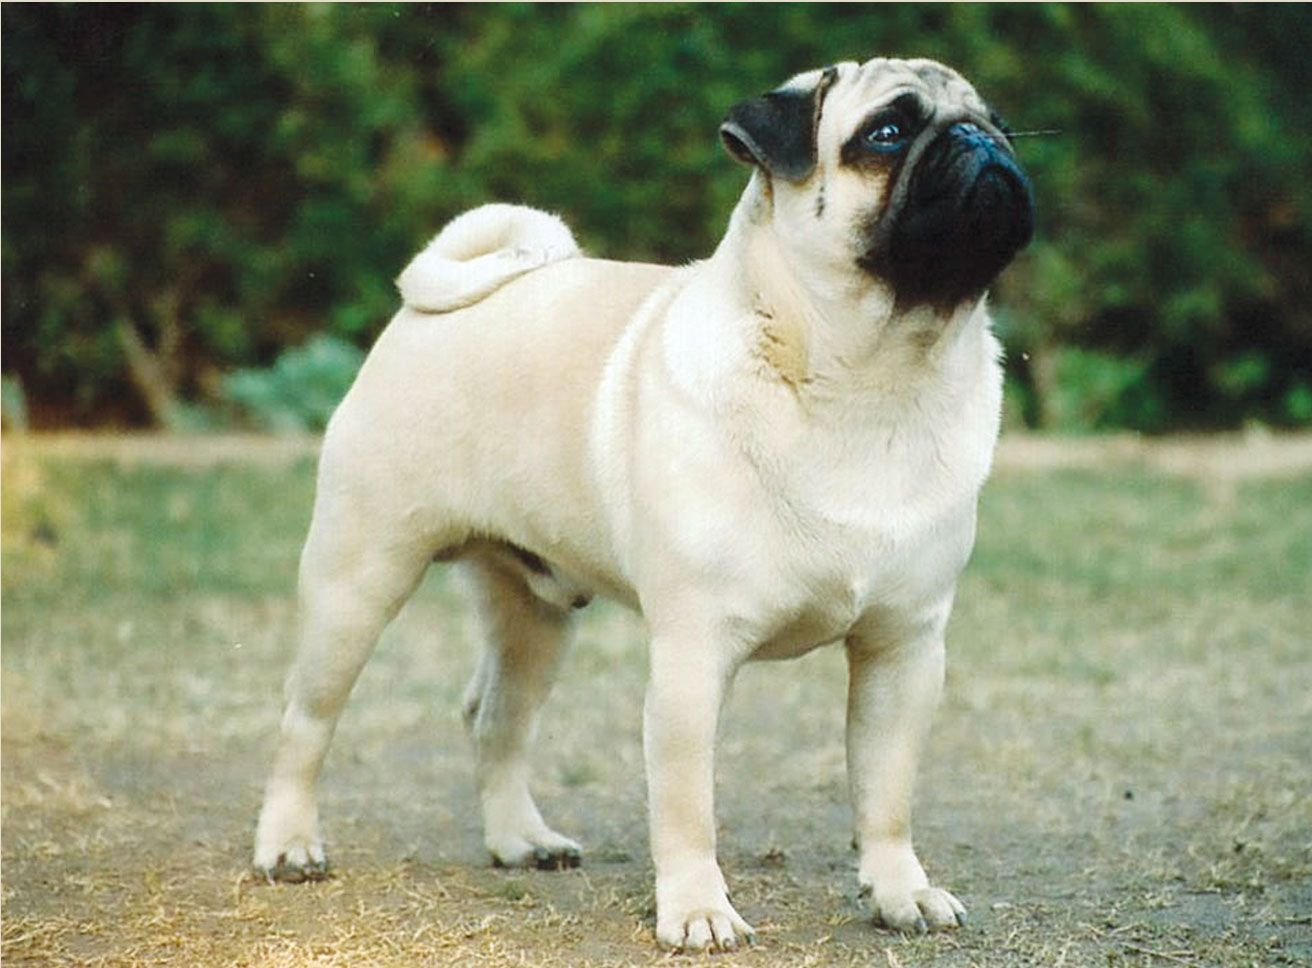 Pug Dog Hd Wallpapers Puppy Wallpaper Pug Dog Dog Wallpaper